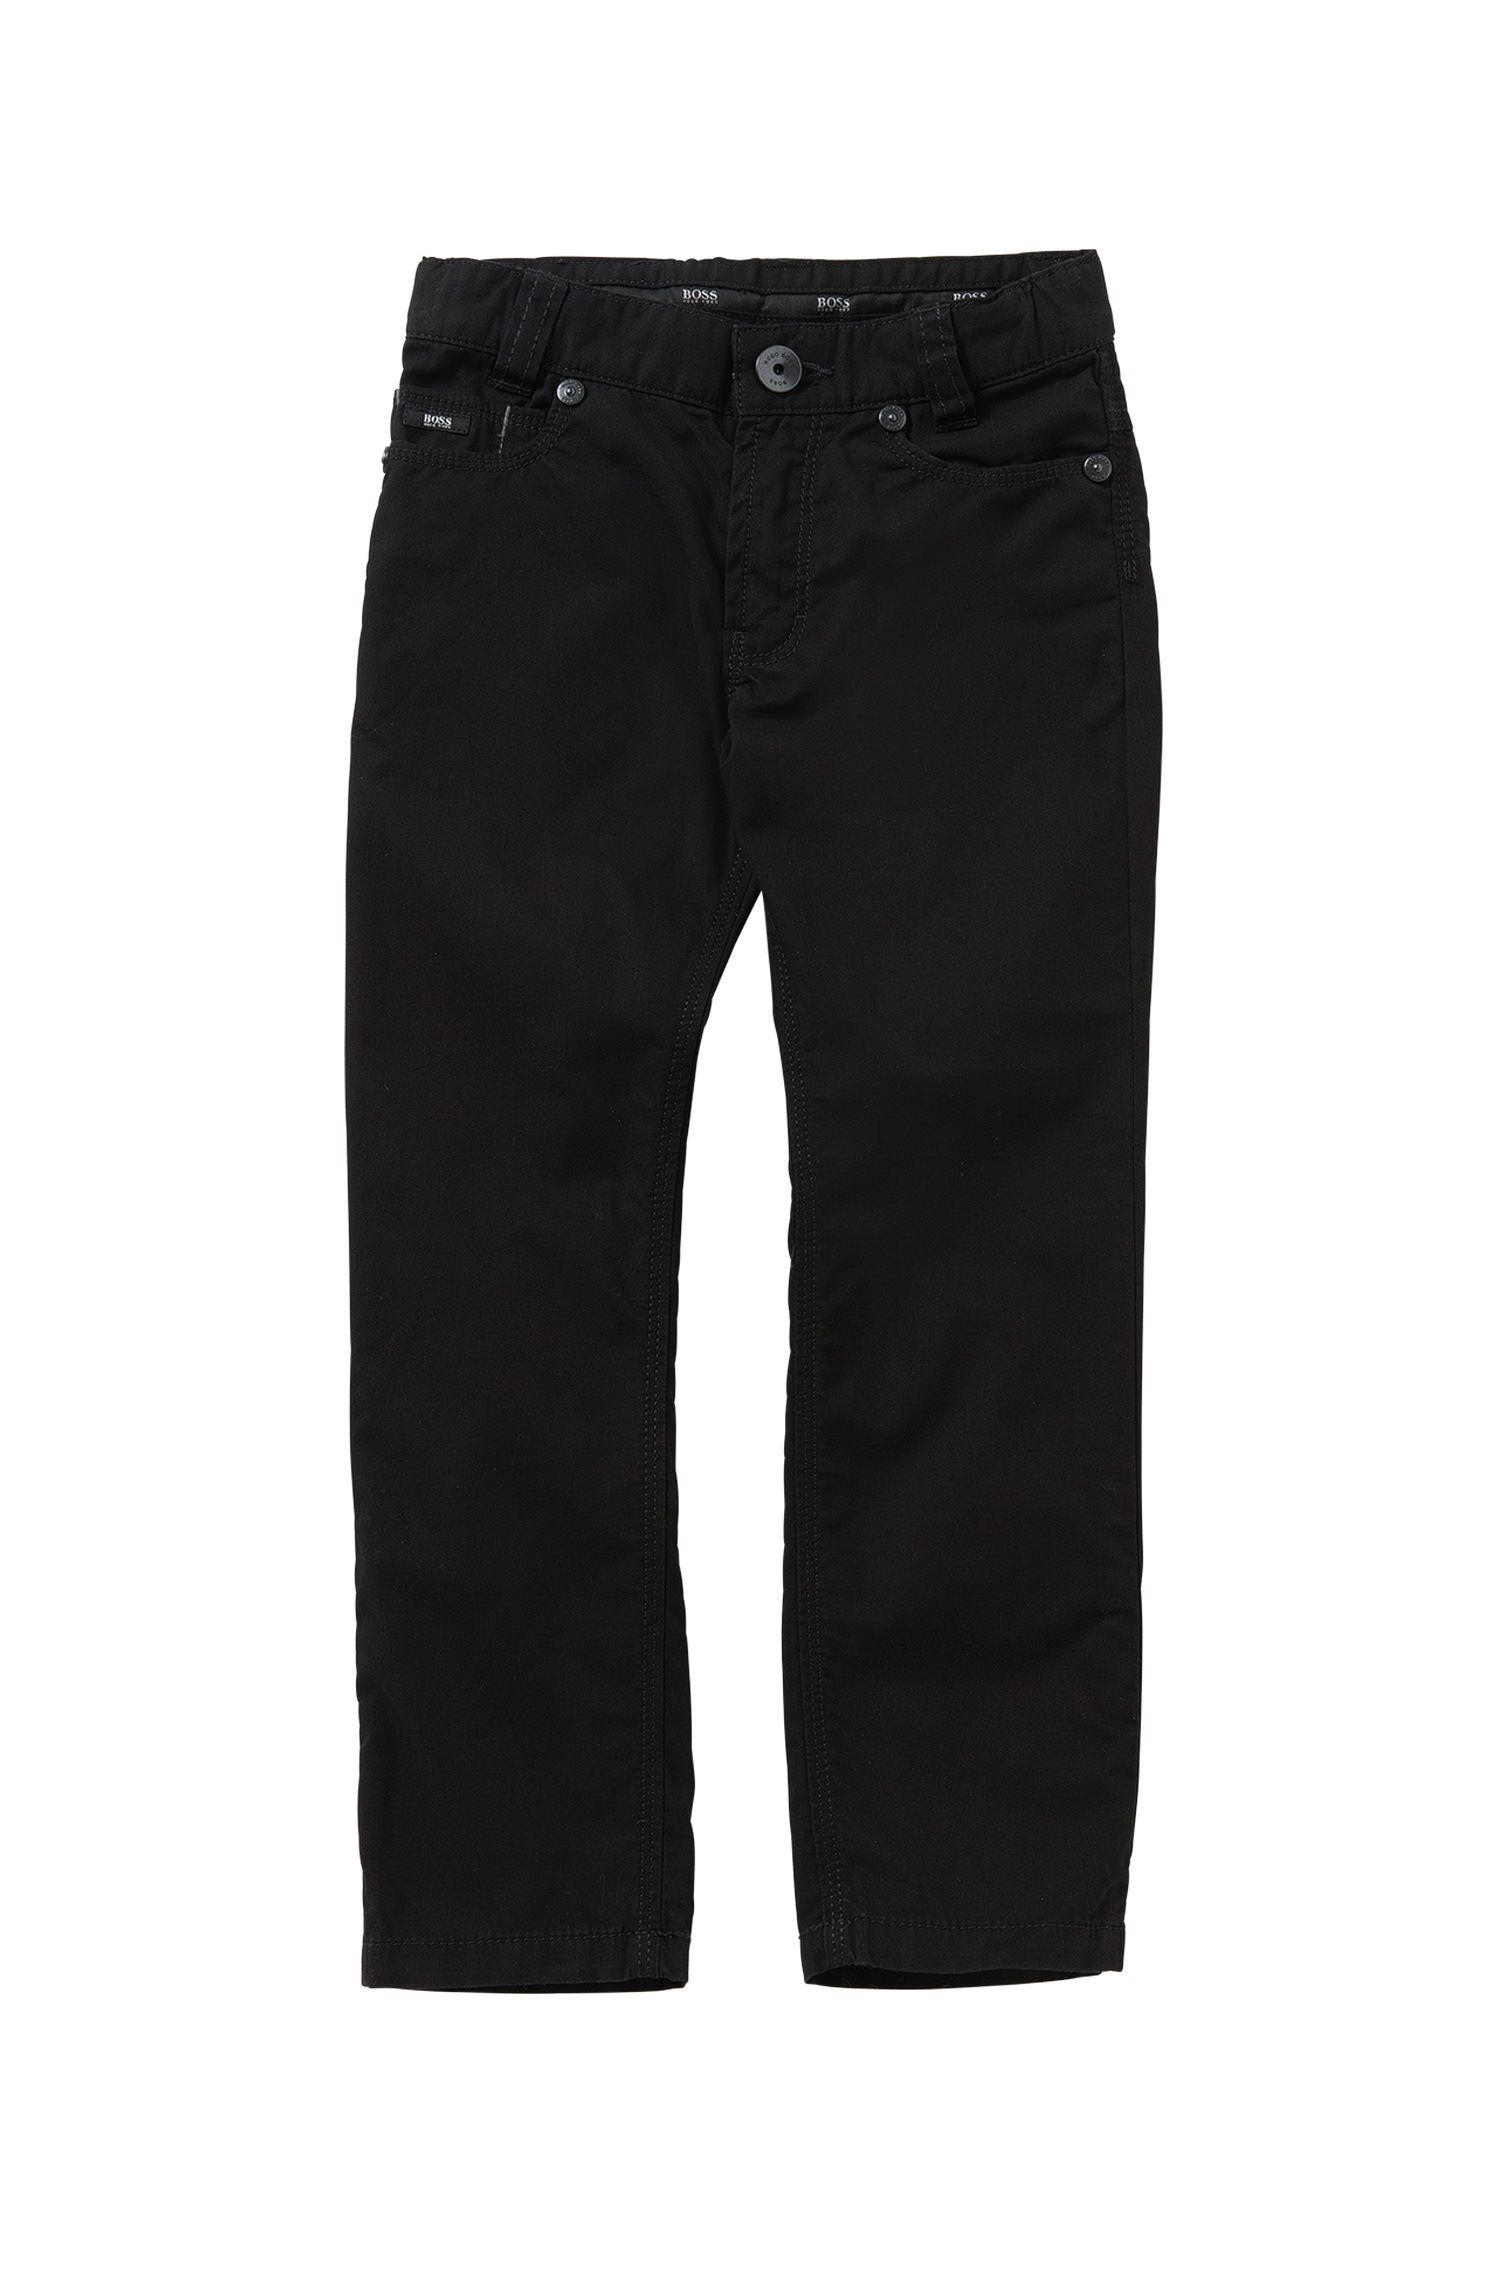 Unifarbene Slim-Fit Kids-Hose aus Baumwolle: 'J24393'